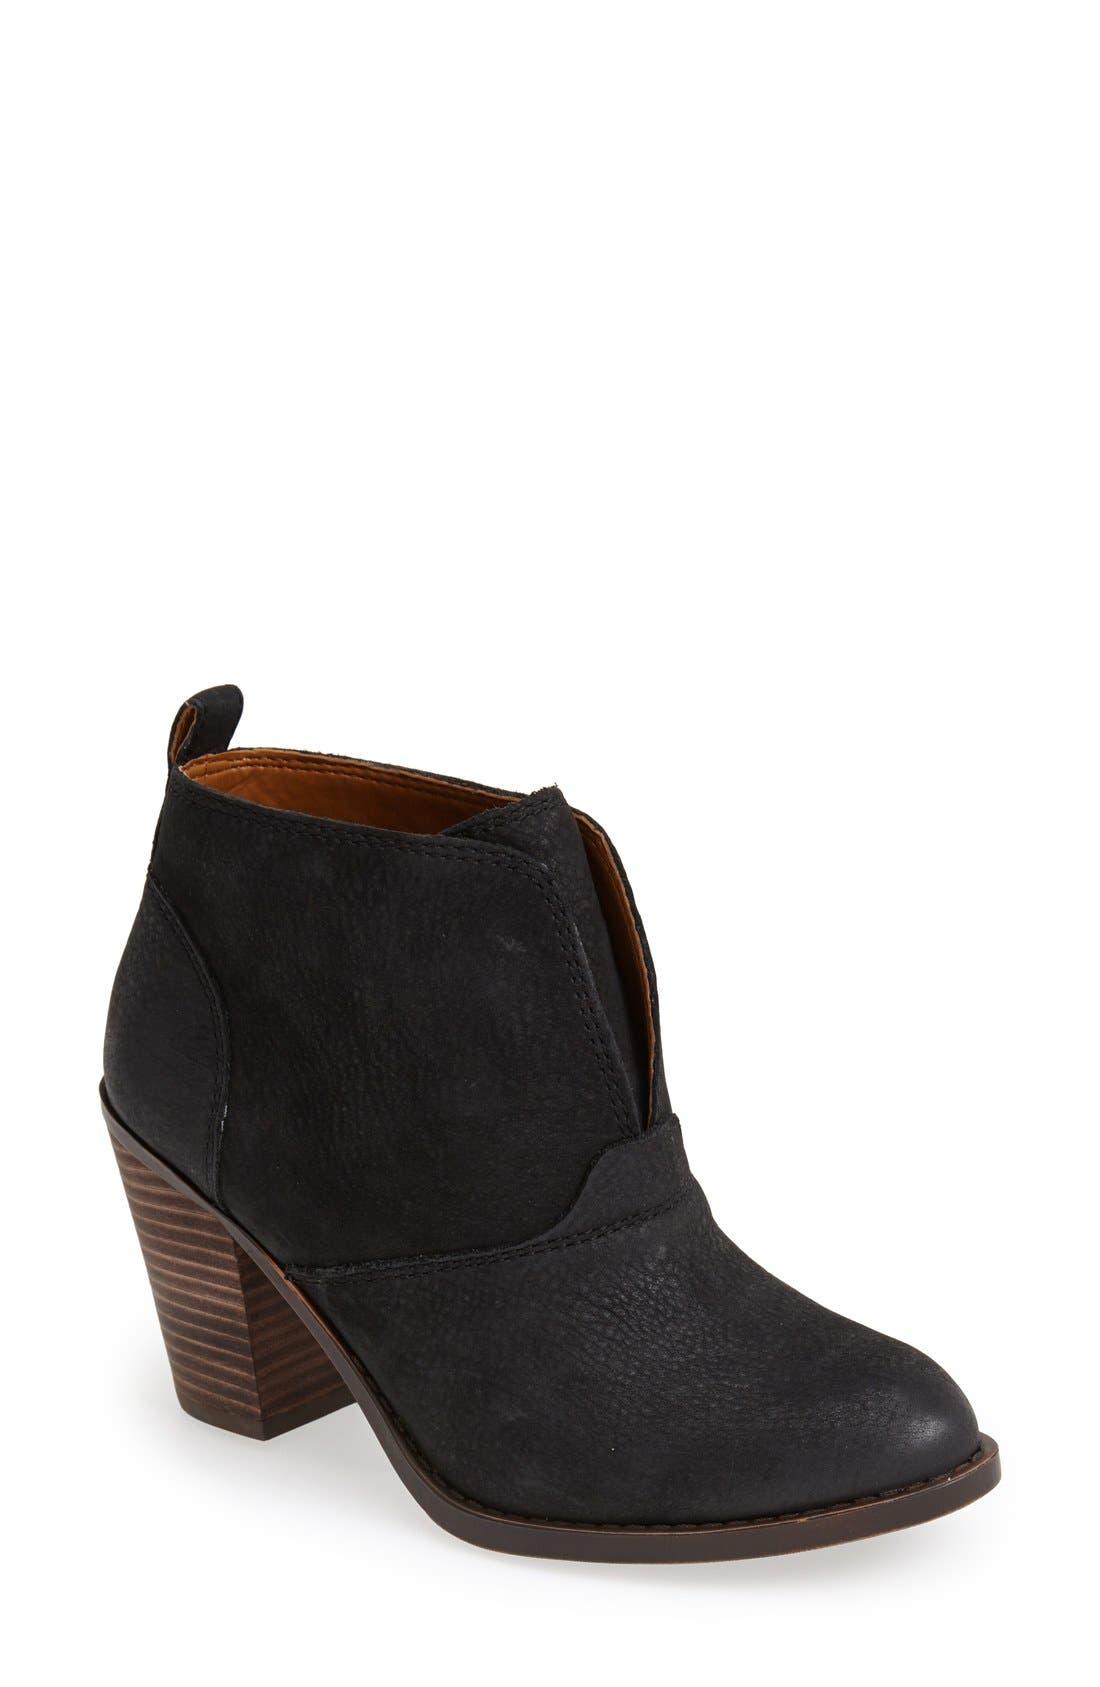 'Ehllen' Textured Leather Bootie, Main, color, 001